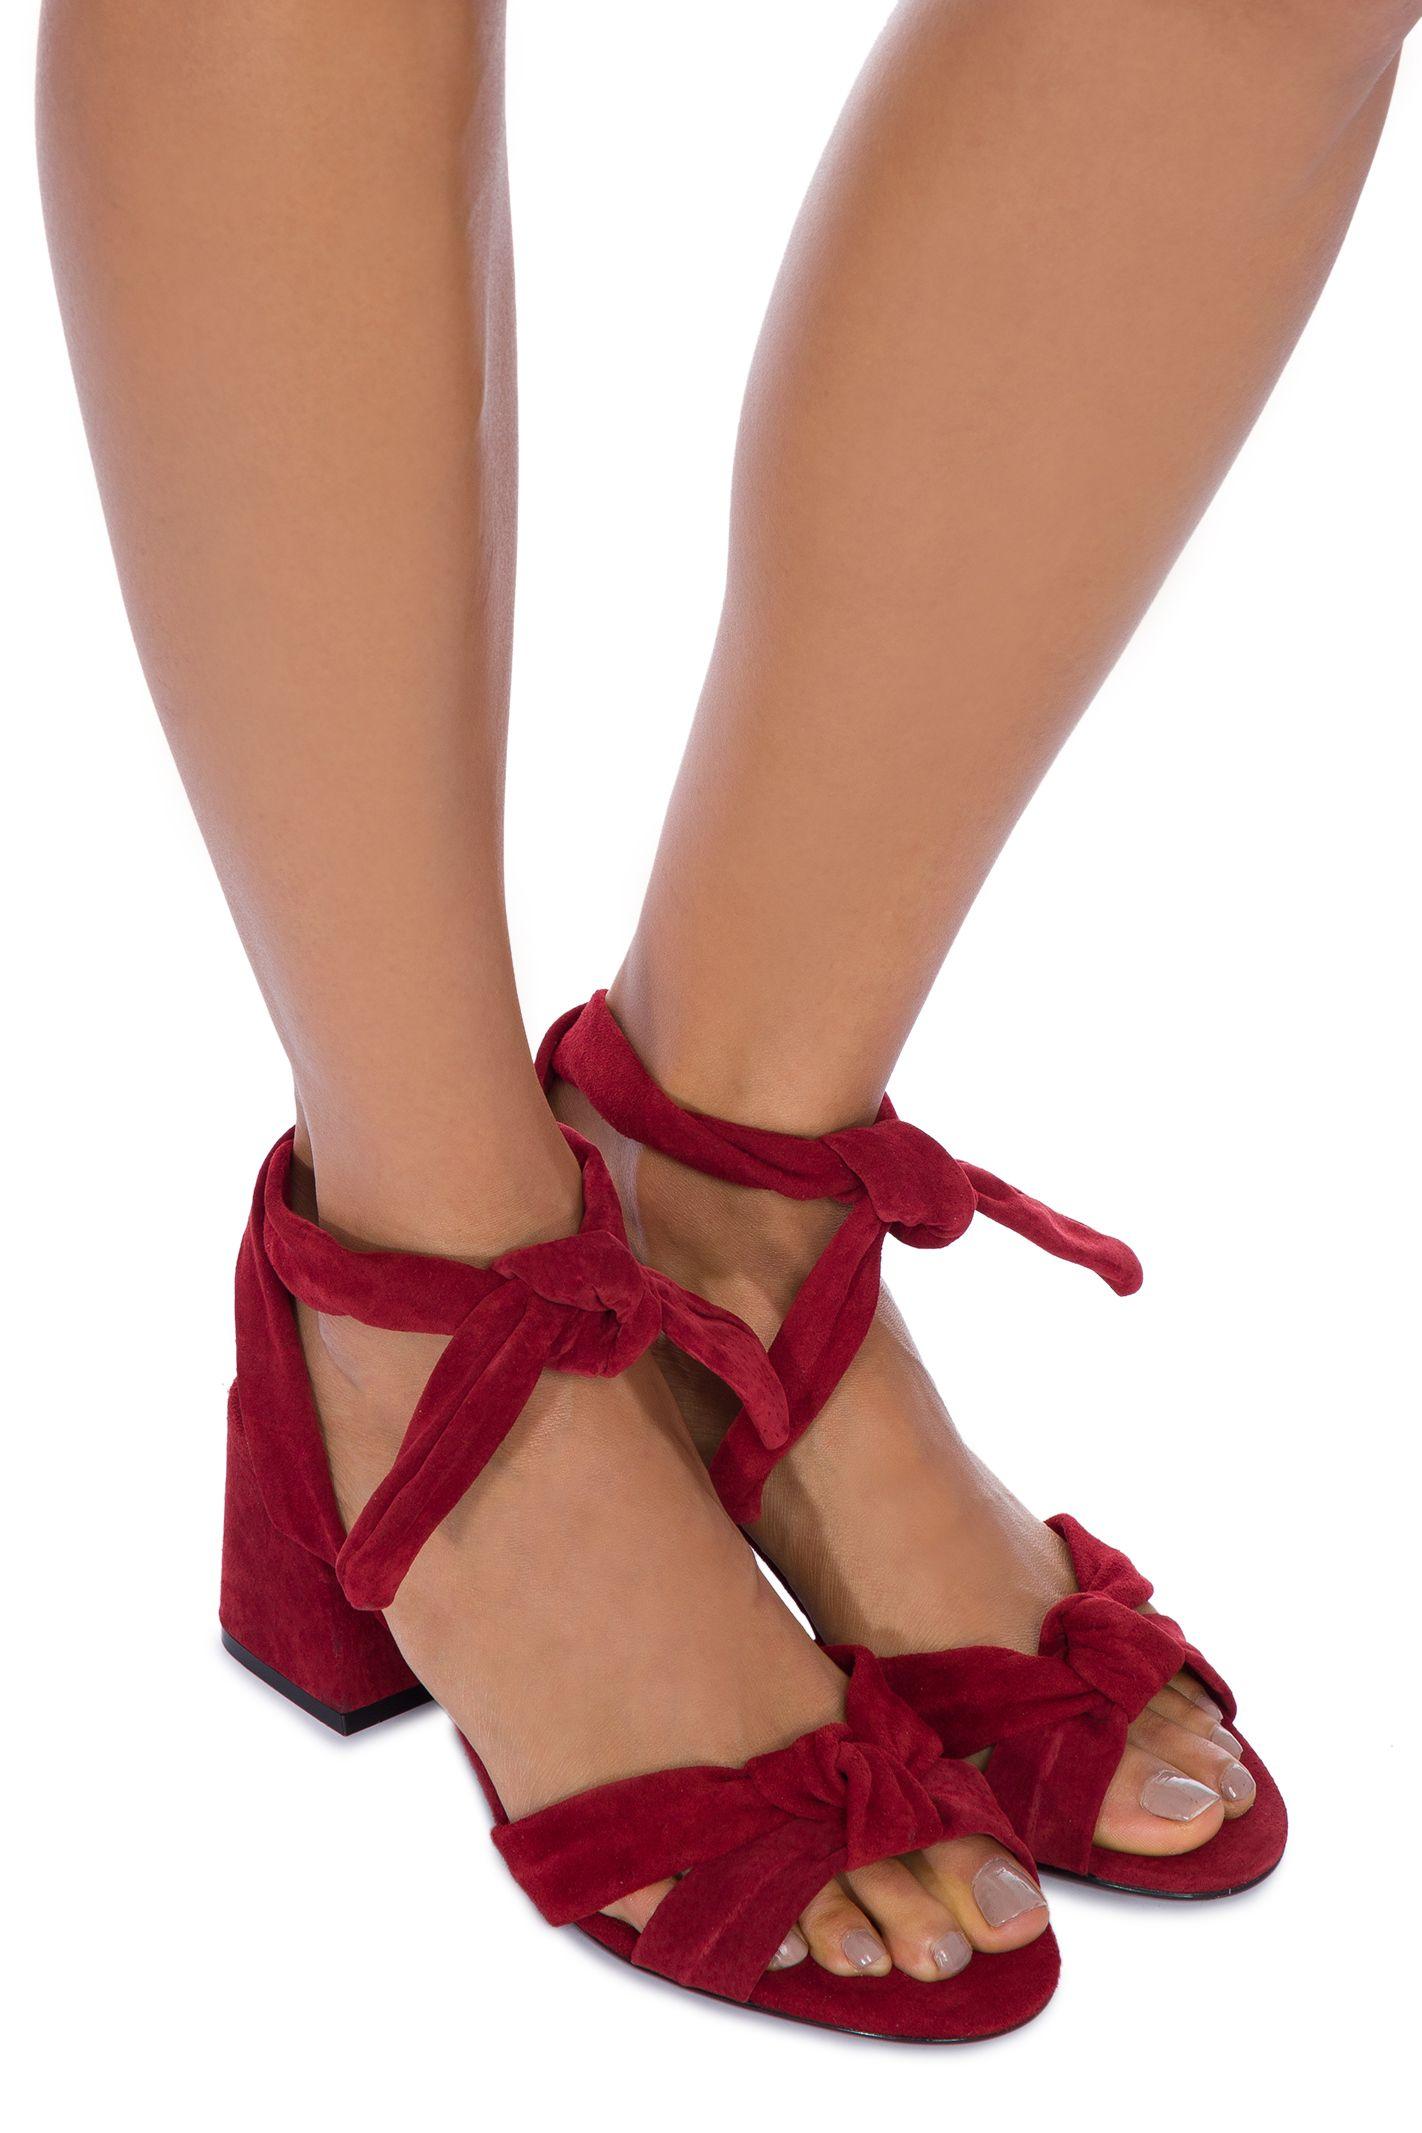 d1e3d980a Sandália block heel knot schutz - Vinho em 2019